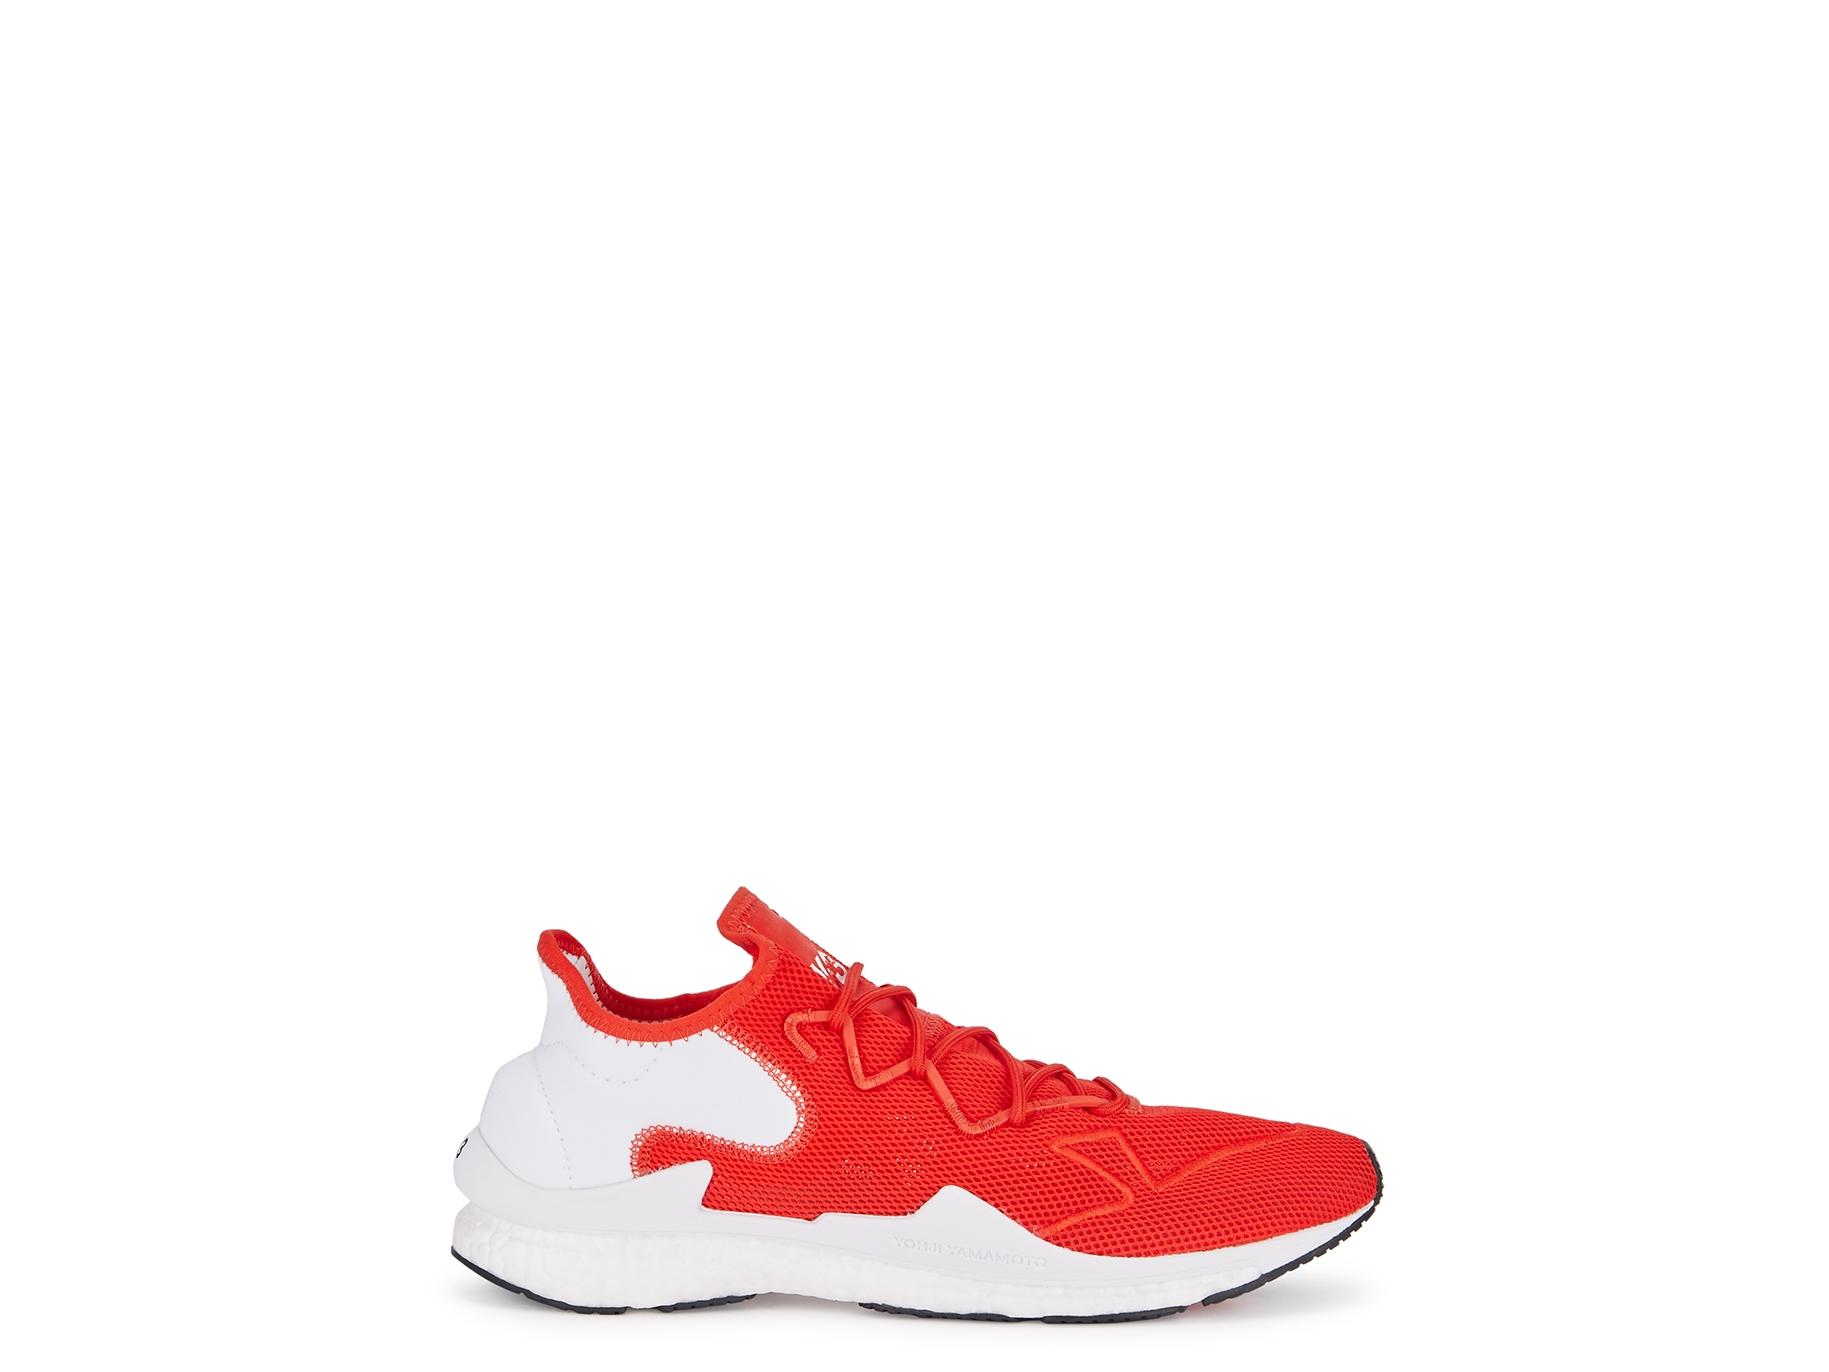 ec6a41e959918 Y-3 Adizero Runner red mesh trainers - Harvey Nichols